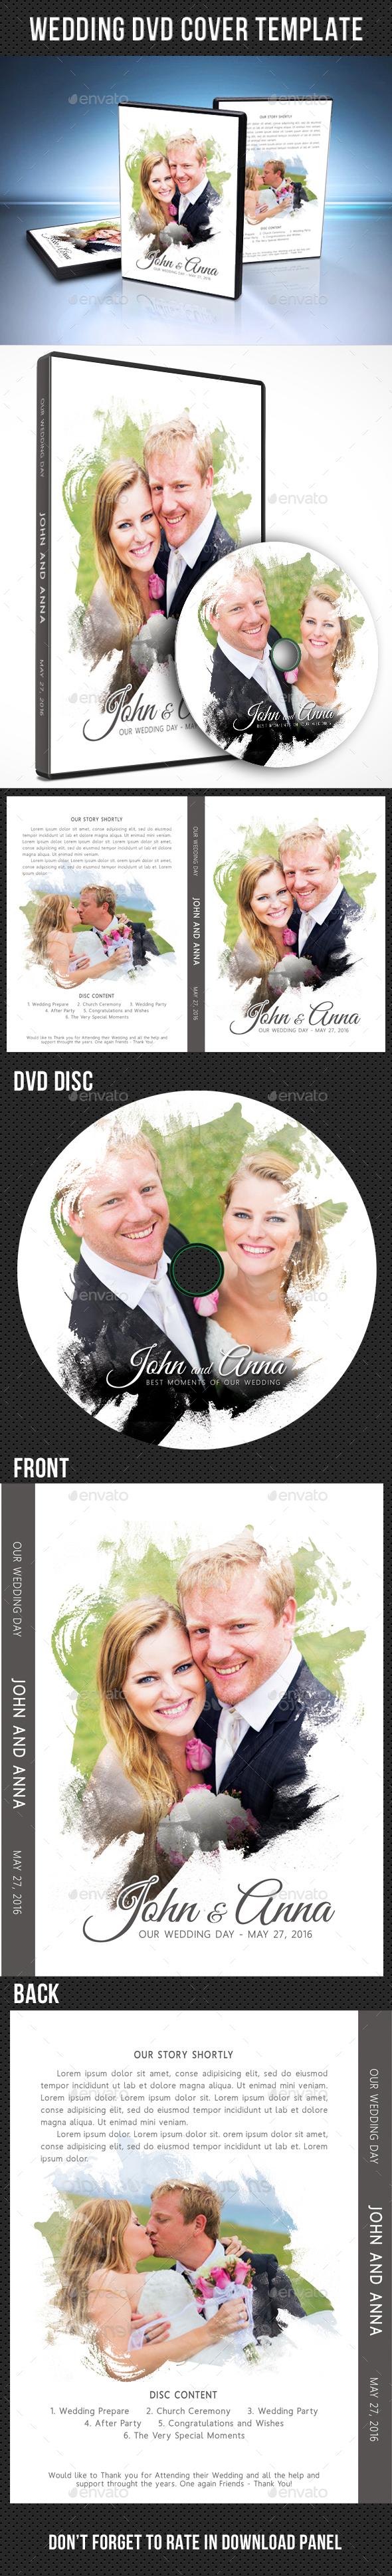 Wedding DVD Cover Template 17 - CD & DVD Artwork Print Templates